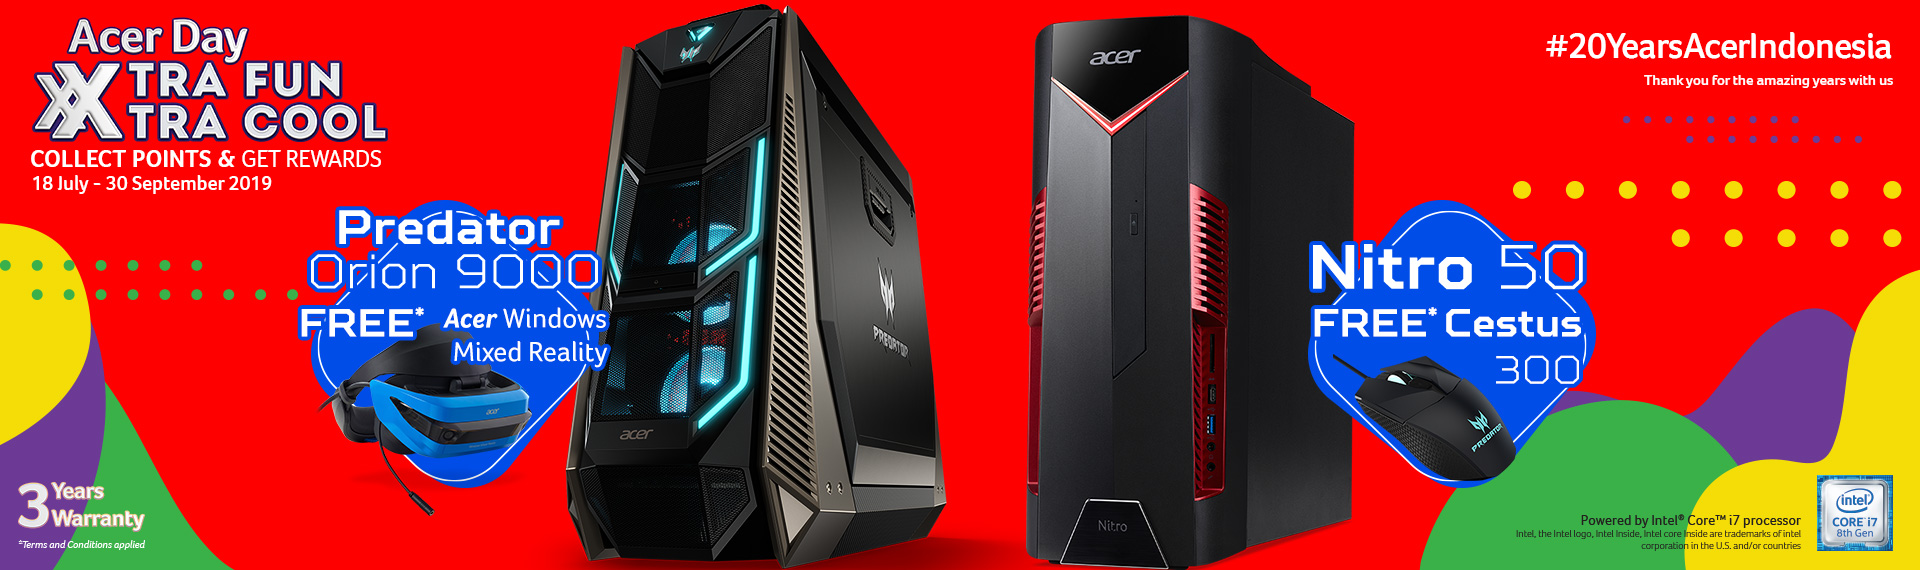 Produk Gaming Acer Day 2019 Banjir Hadiah Senilai Jutaan Rupiah!